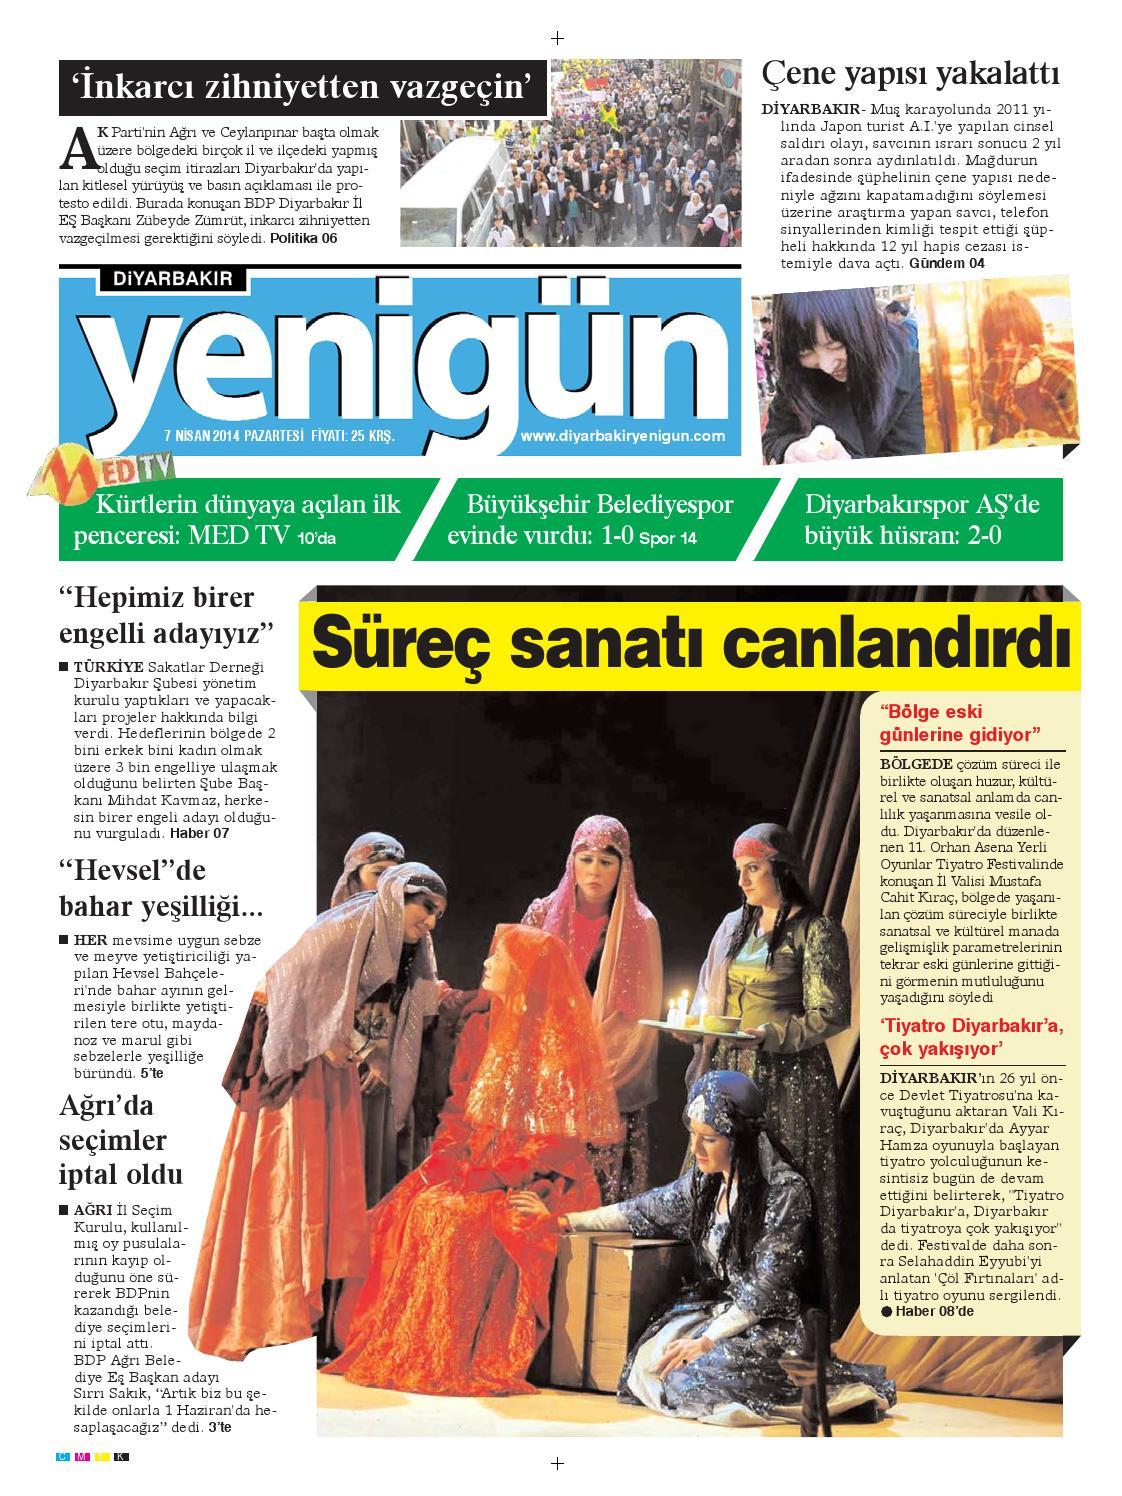 Diyarbakir Yenigun Gazetesi 7 Nisan 2014 By Osman Ergun Issuu